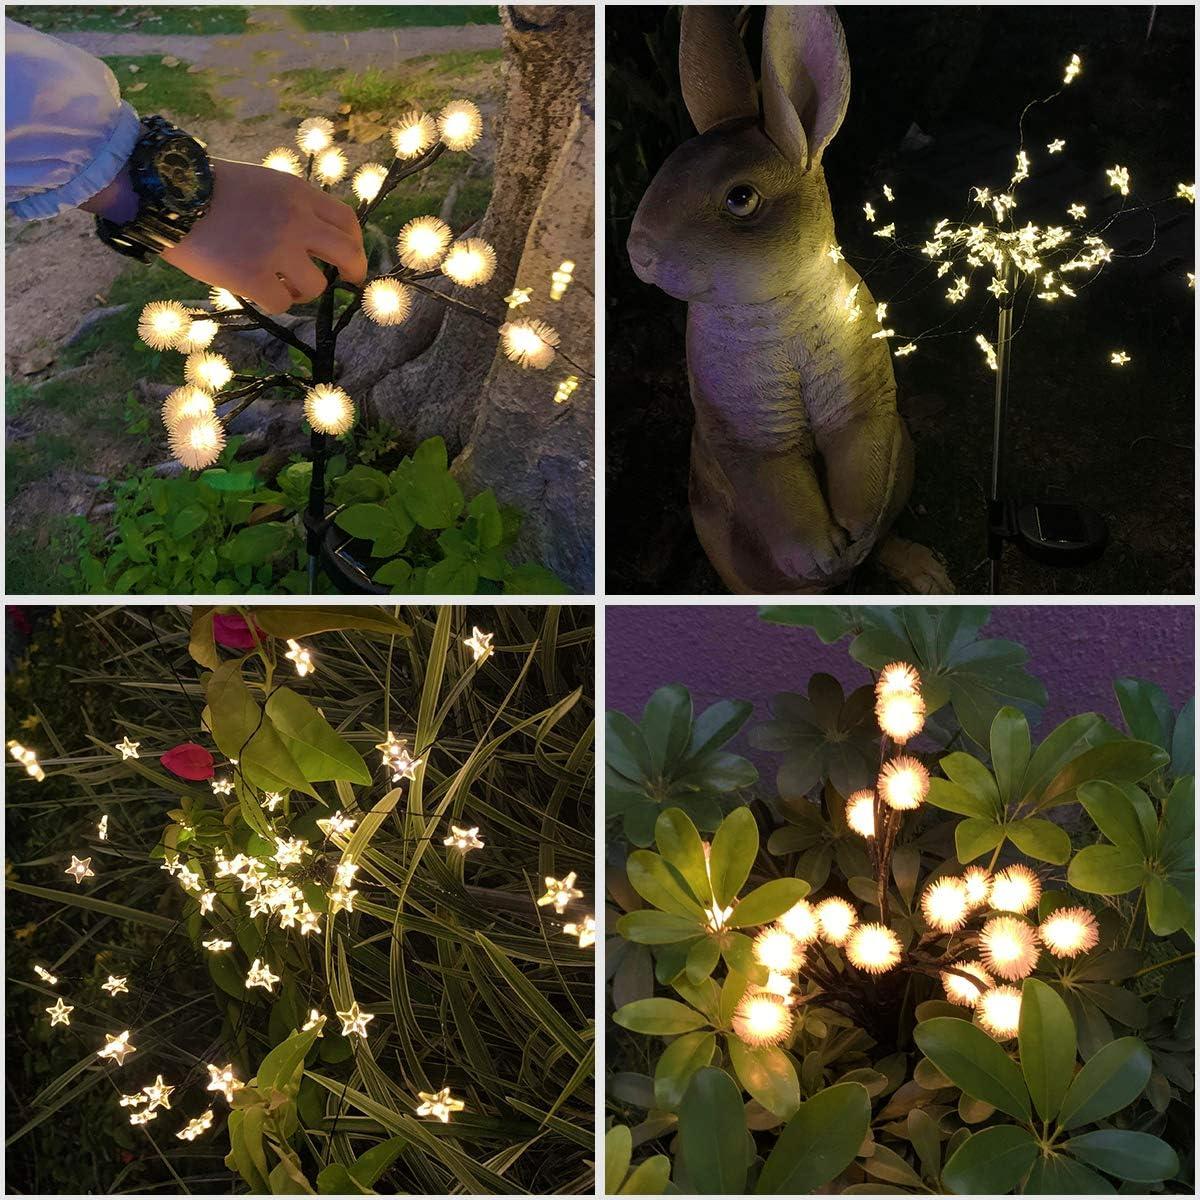 Upgraded Outdoor Solar Lights, Decorative Solar Garden Lights Solar Fairy Flower Lights Waterproof for Patio Yard Pathway Garden Christmas Decor (4 Pack,Warm White)